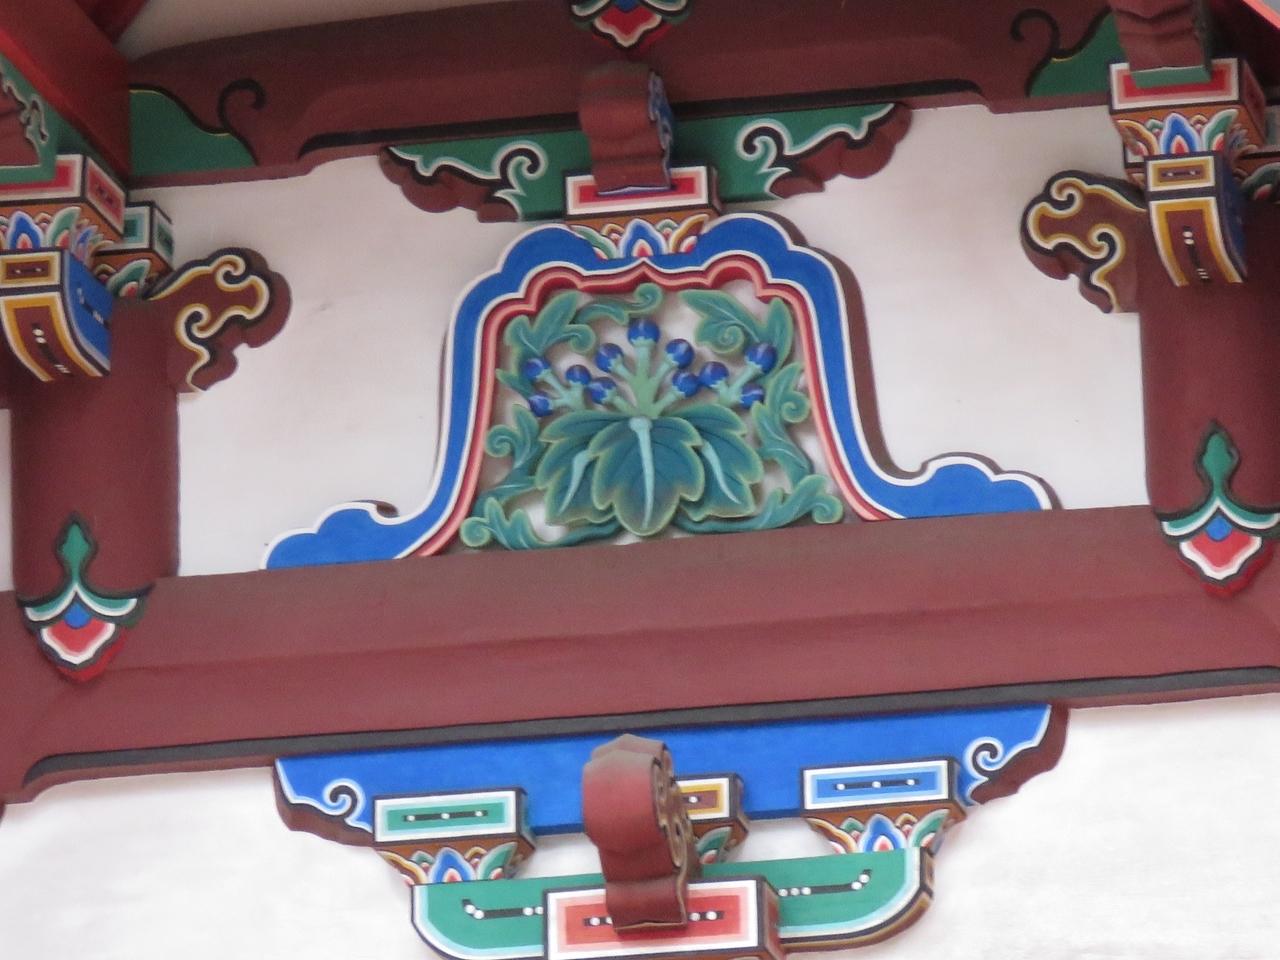 s-蟇股彫刻 太閤桐